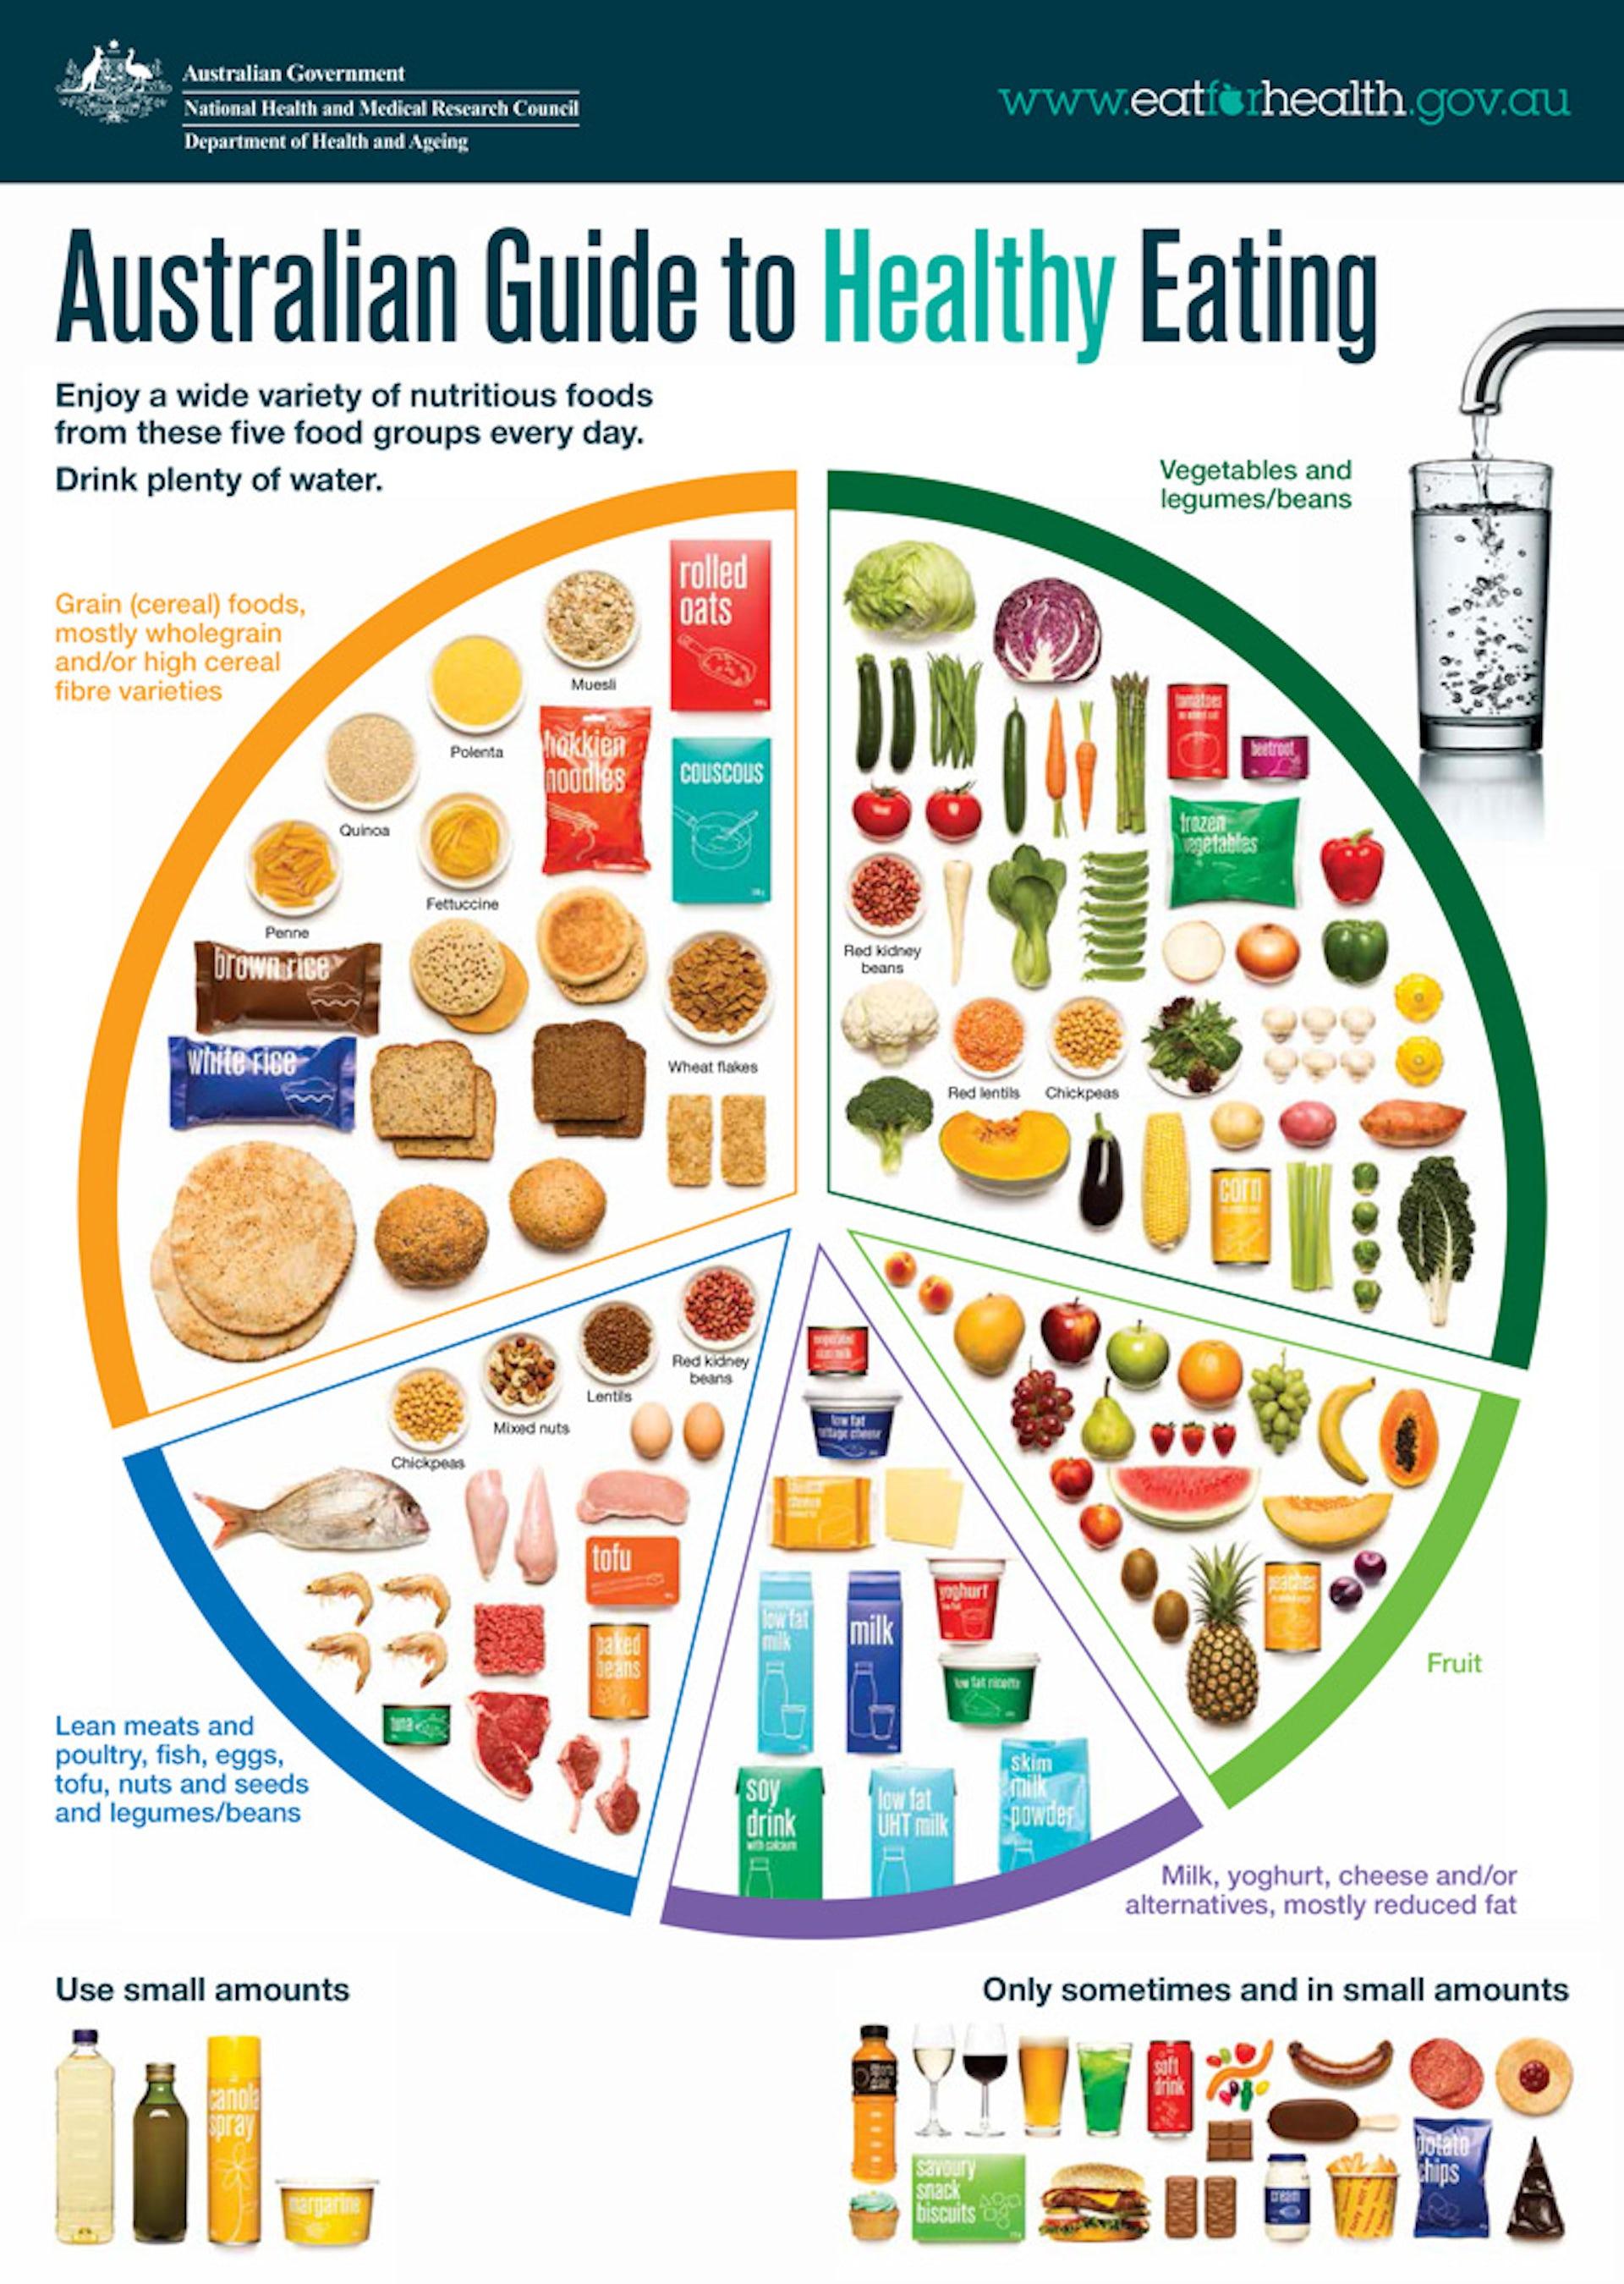 a healthy diet is cheaper than junk food but good still